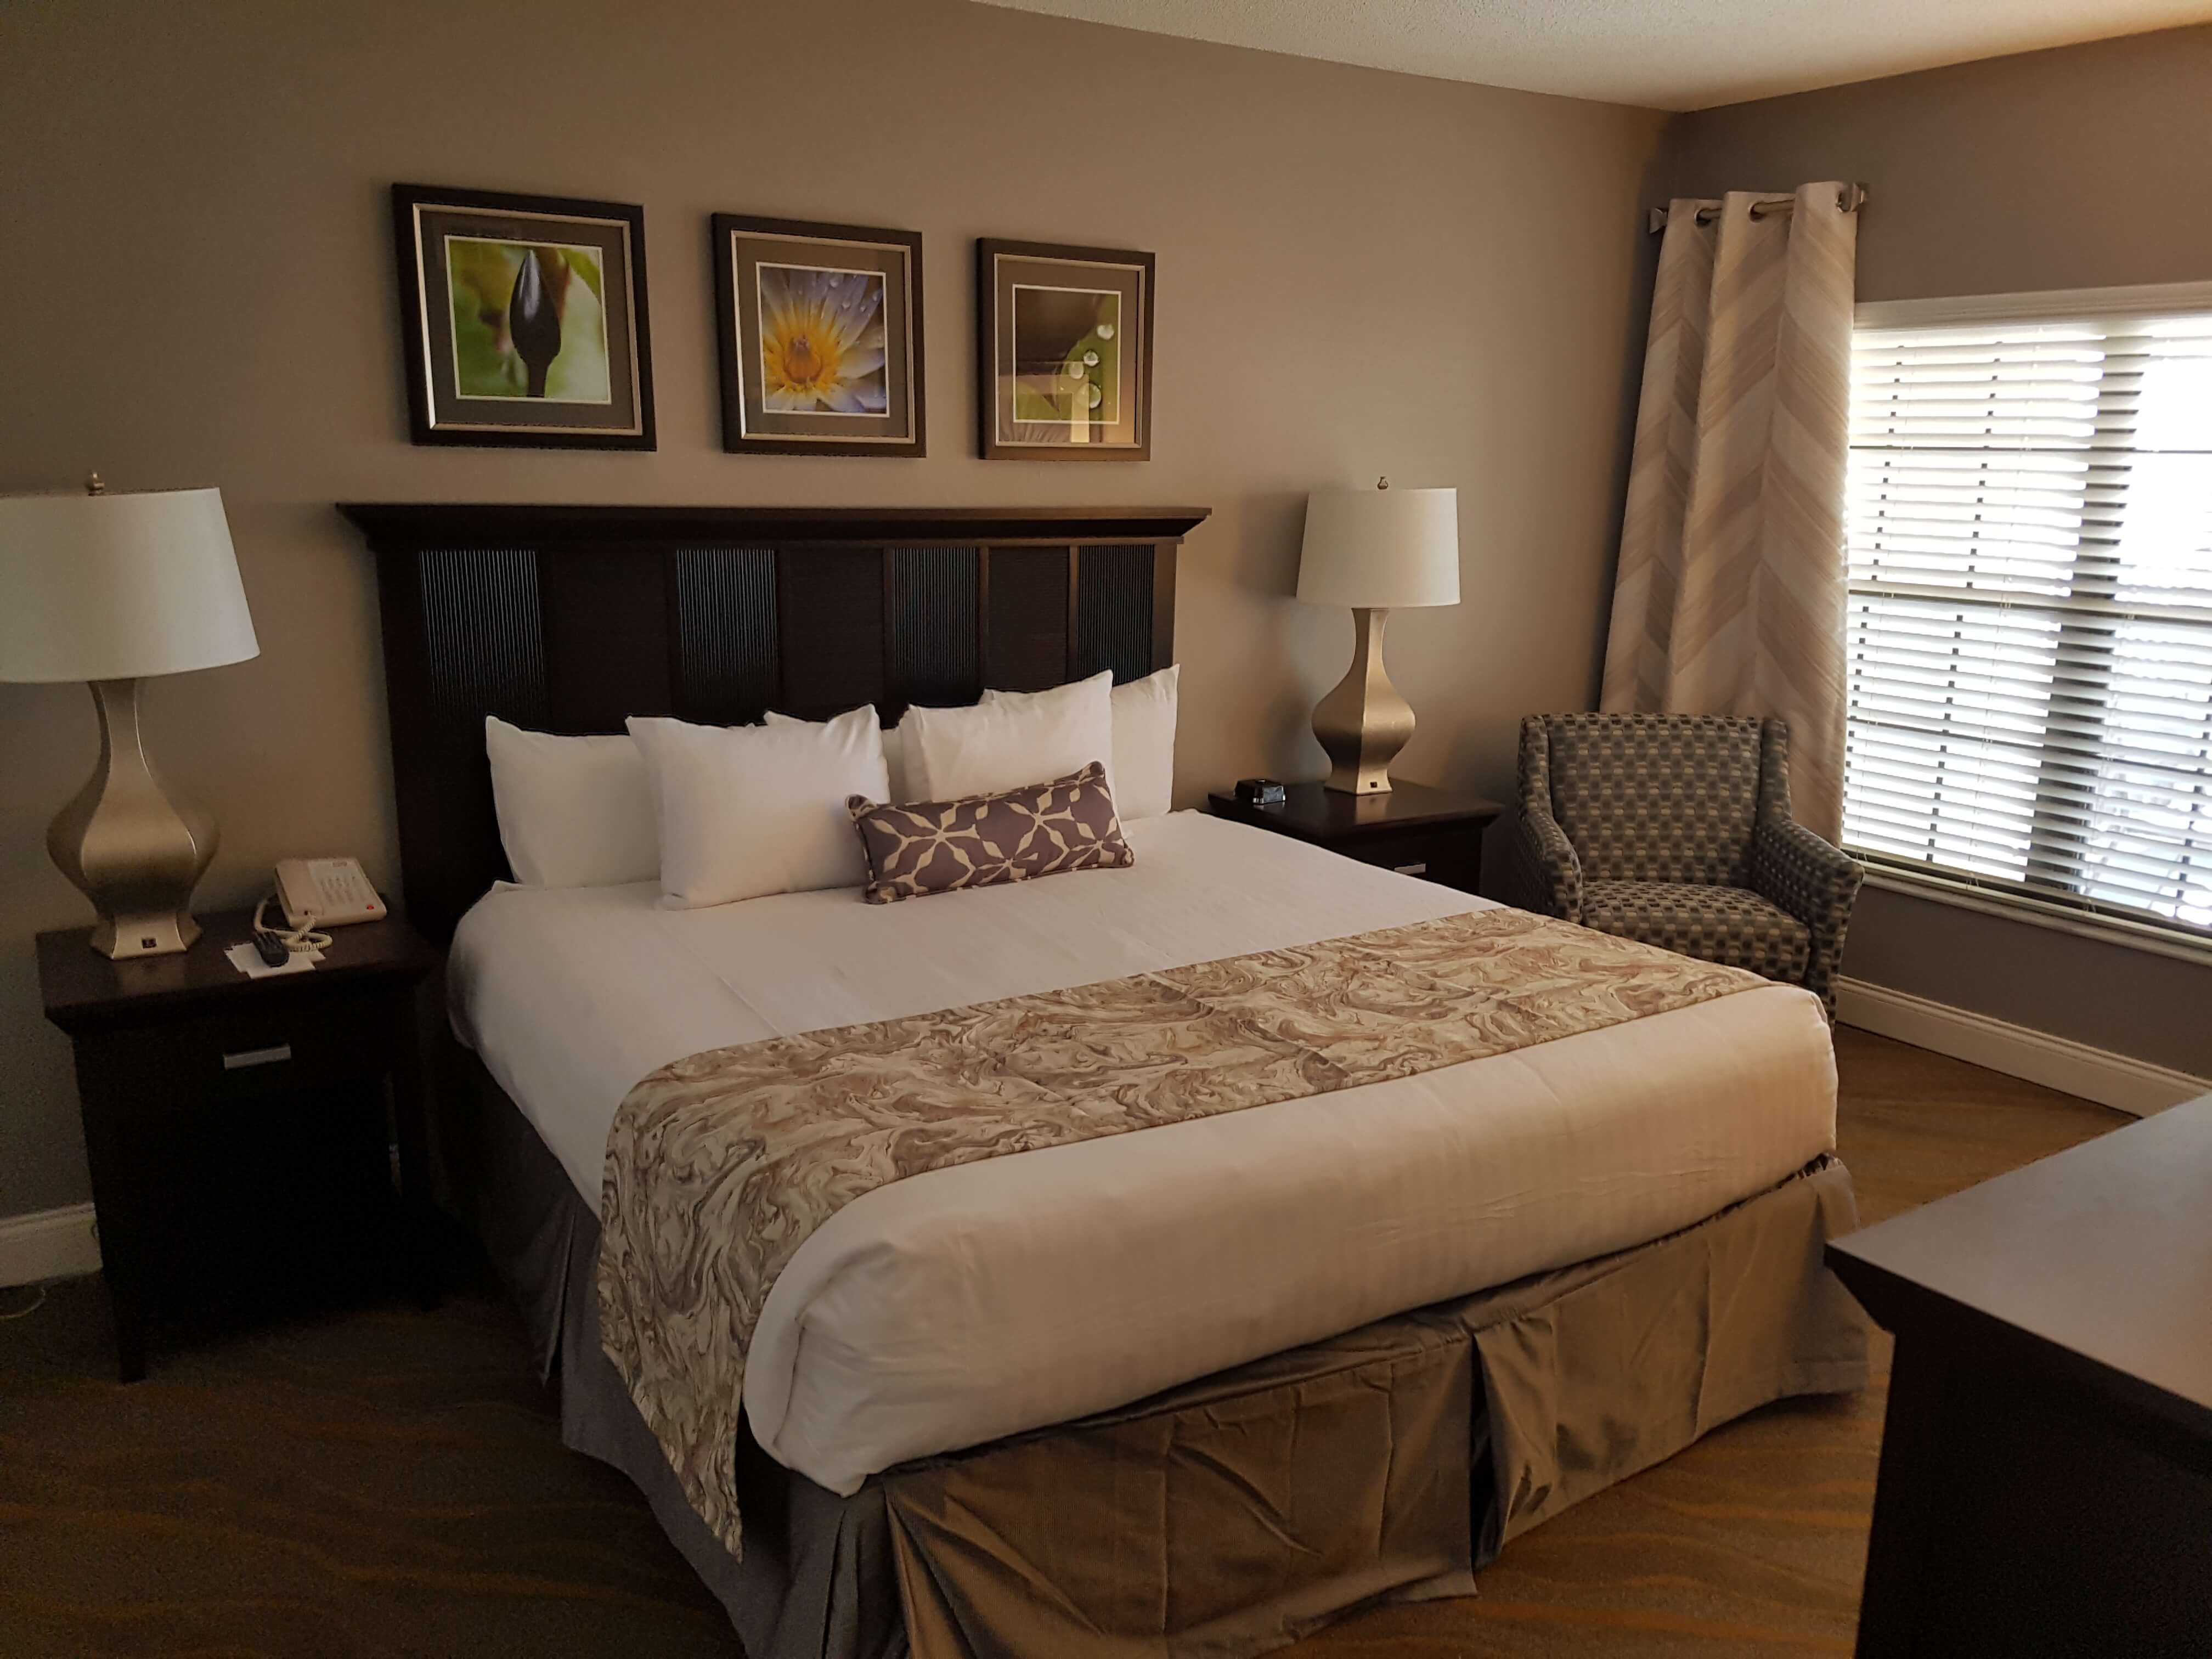 Holiday Inn Club Vacations at Orange Lake Resort - West Village (Orange Lake Country Club) image